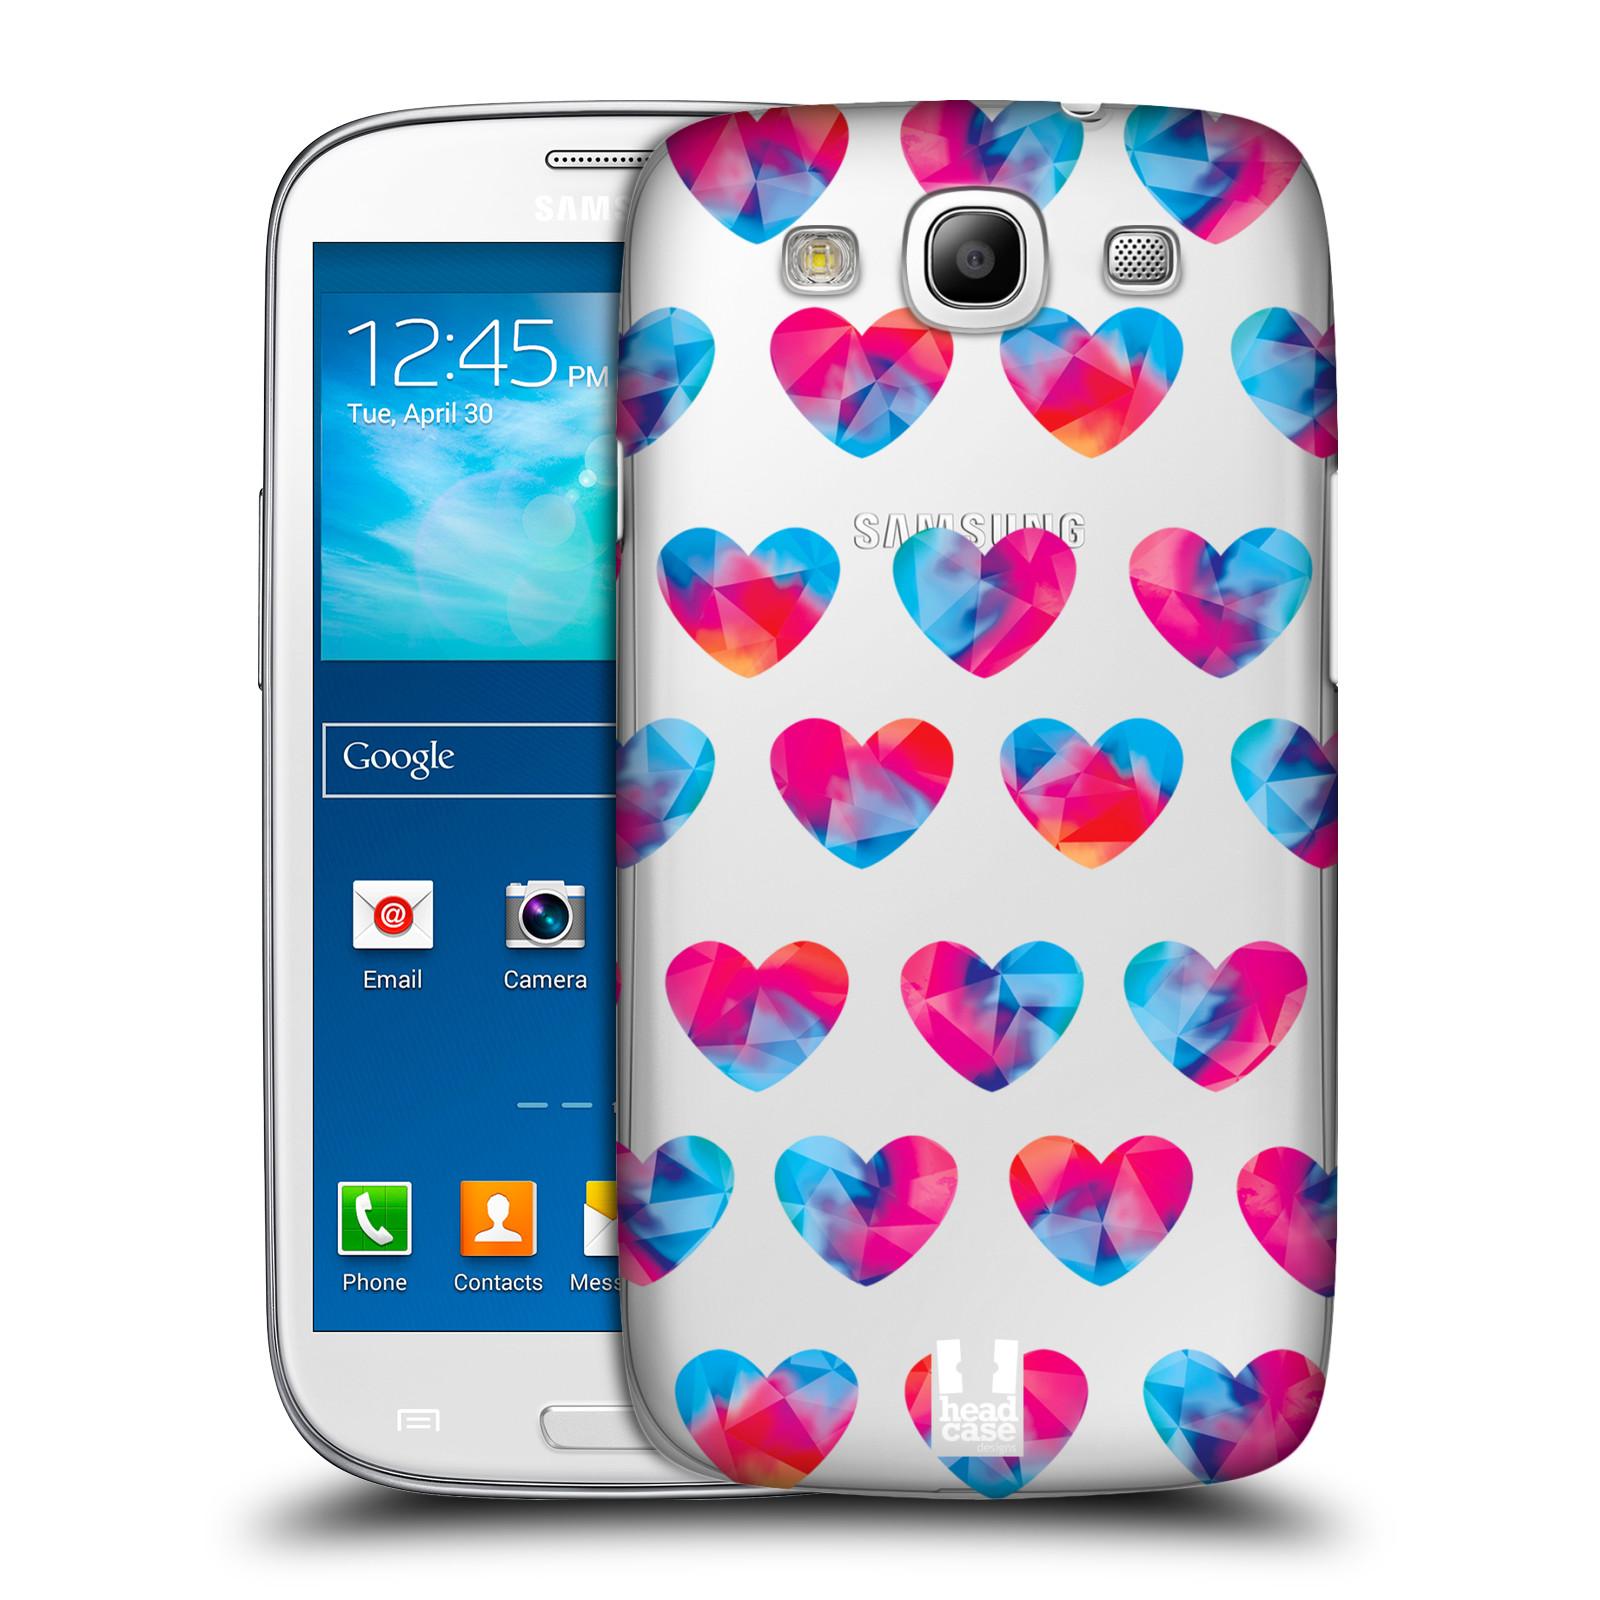 Plastové pouzdro na mobil Samsung Galaxy S3 Neo - Head Case - Srdíčka hrající barvami